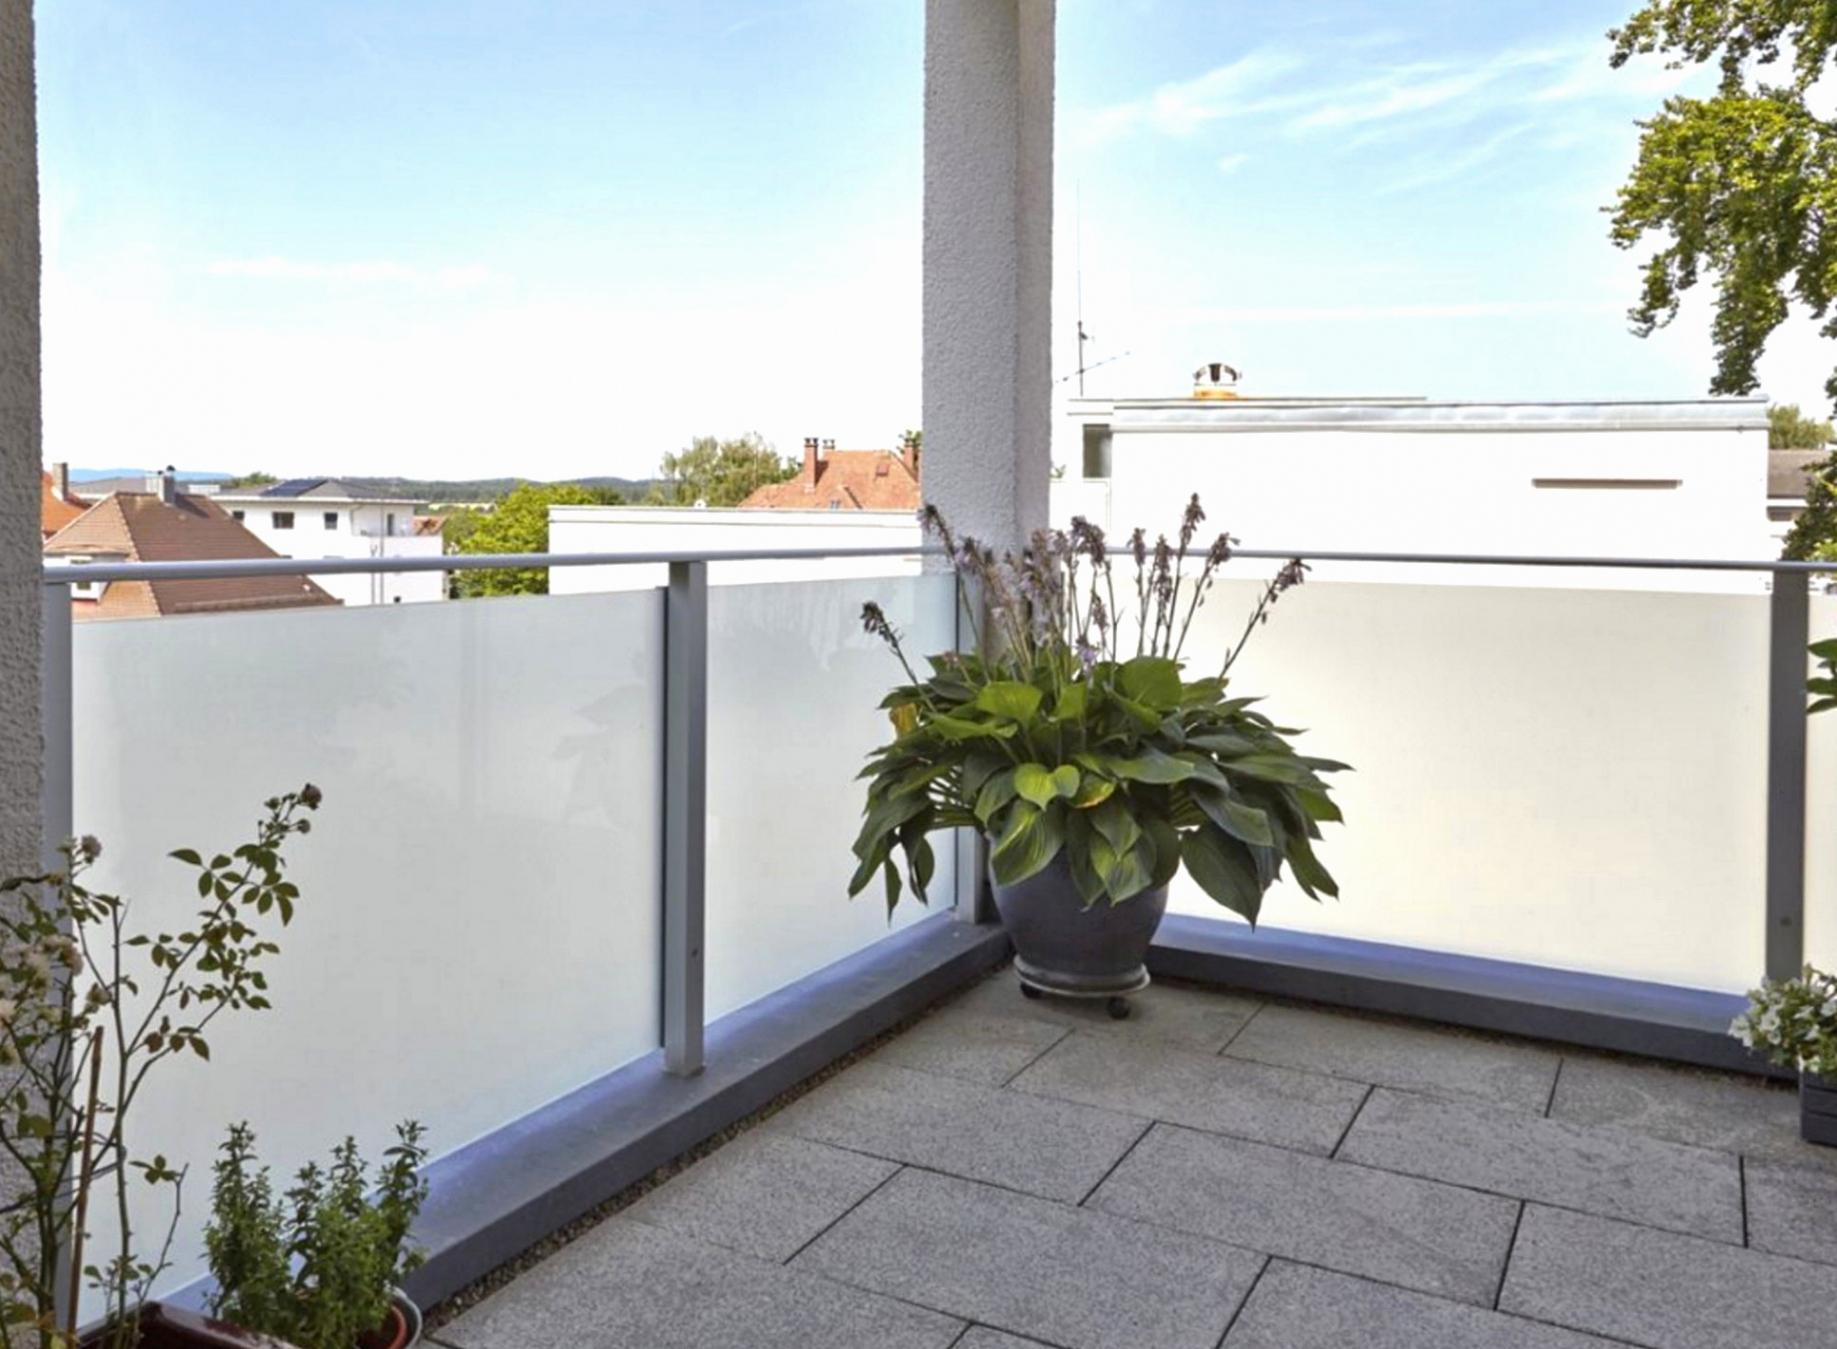 Deko Ideen Selber Machen Garten Elegant Gartendeko Selber Machen — Temobardz Home Blog